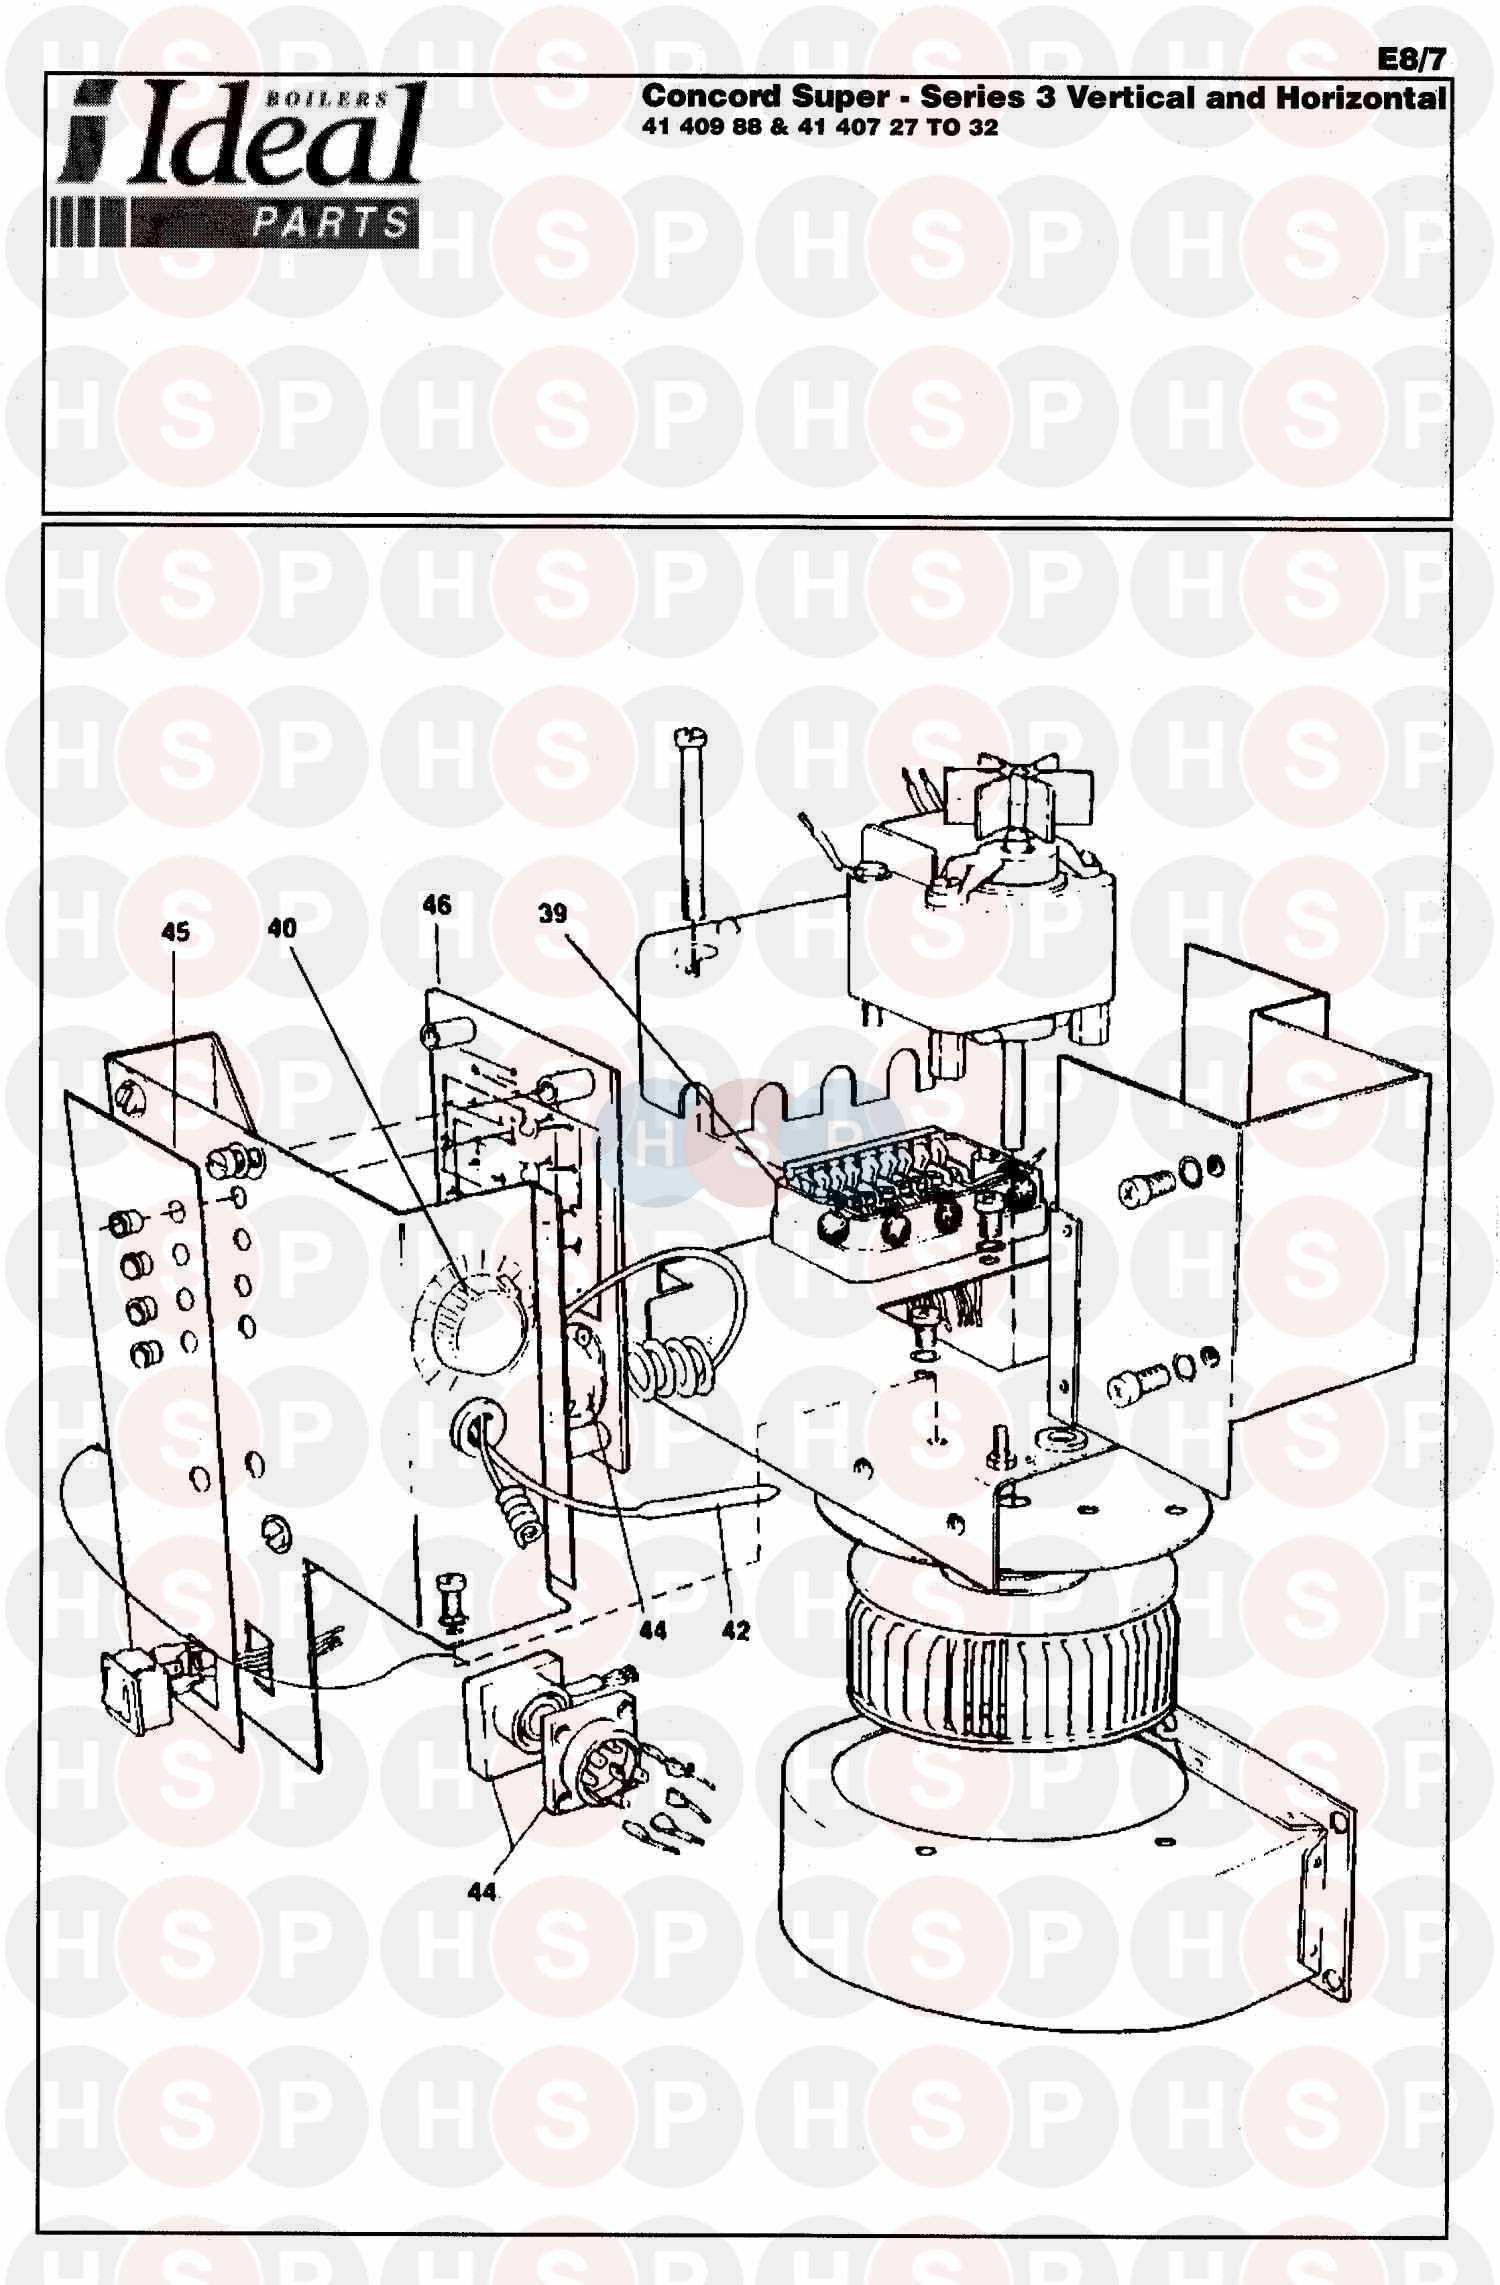 Ideal CONCORD SUPER 50 V&H SERIES 3 (BOILER ASSEMBLY 2